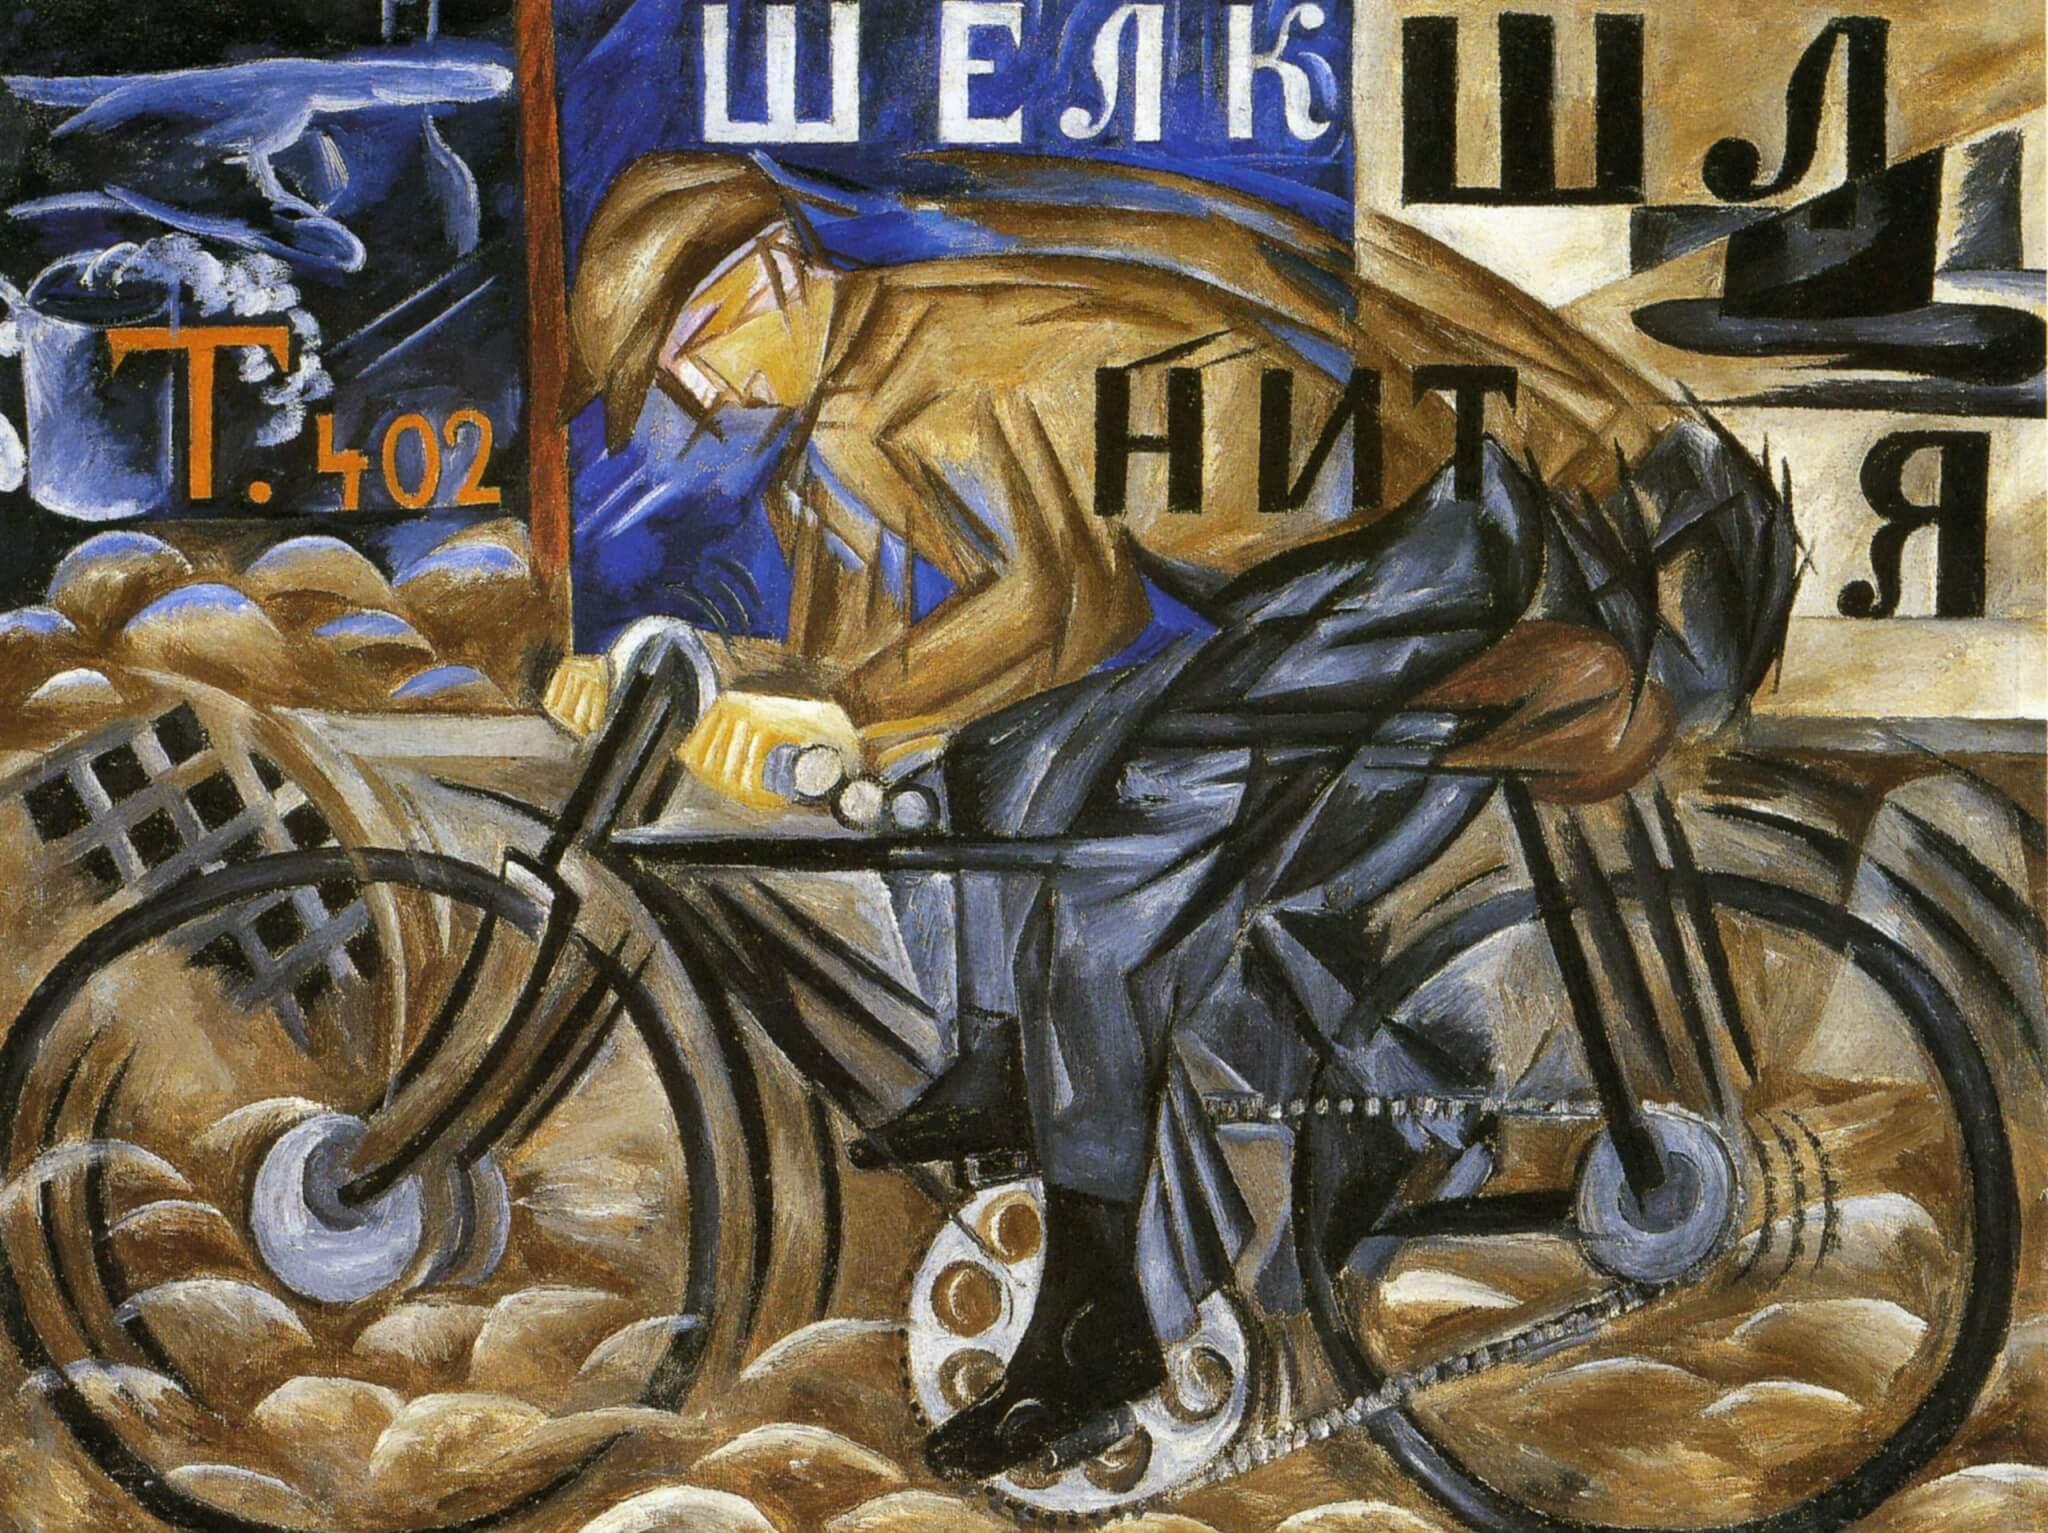 El ciclista, 1913 - Natalia Goncharova - Cubofurismo